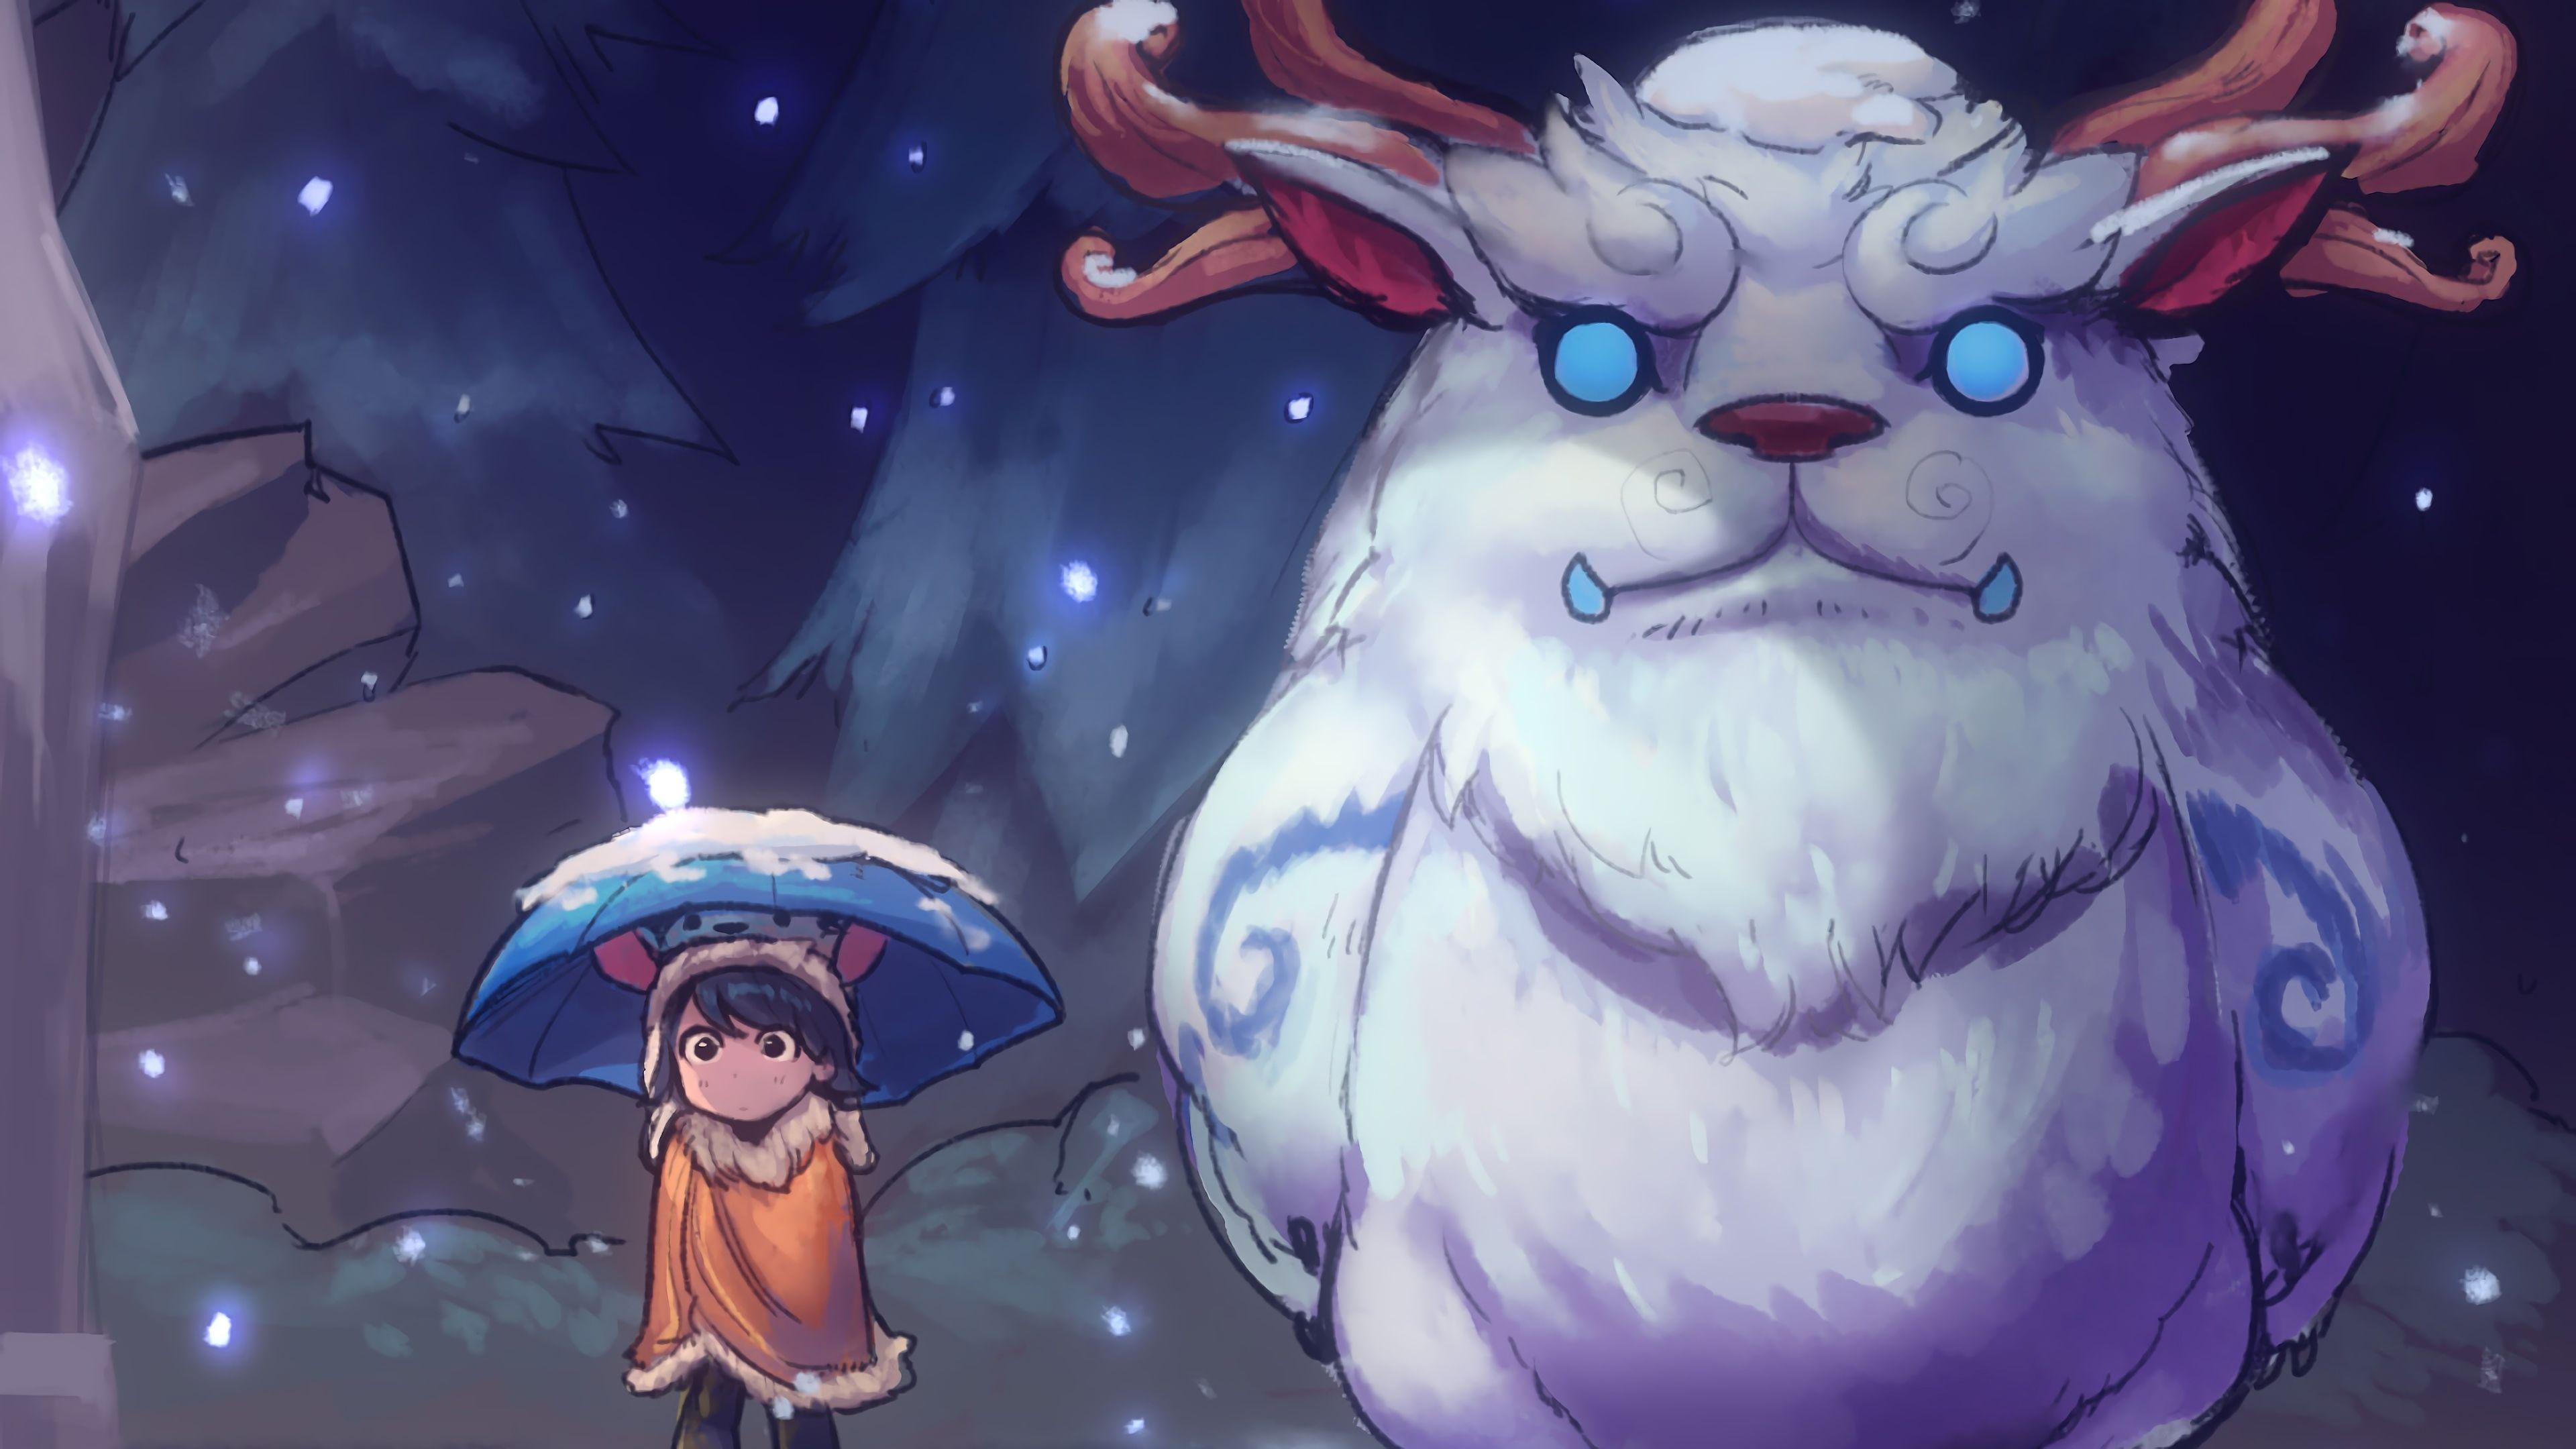 Nunu Rework Art League Of Legends Lol Video Game 3840x2160